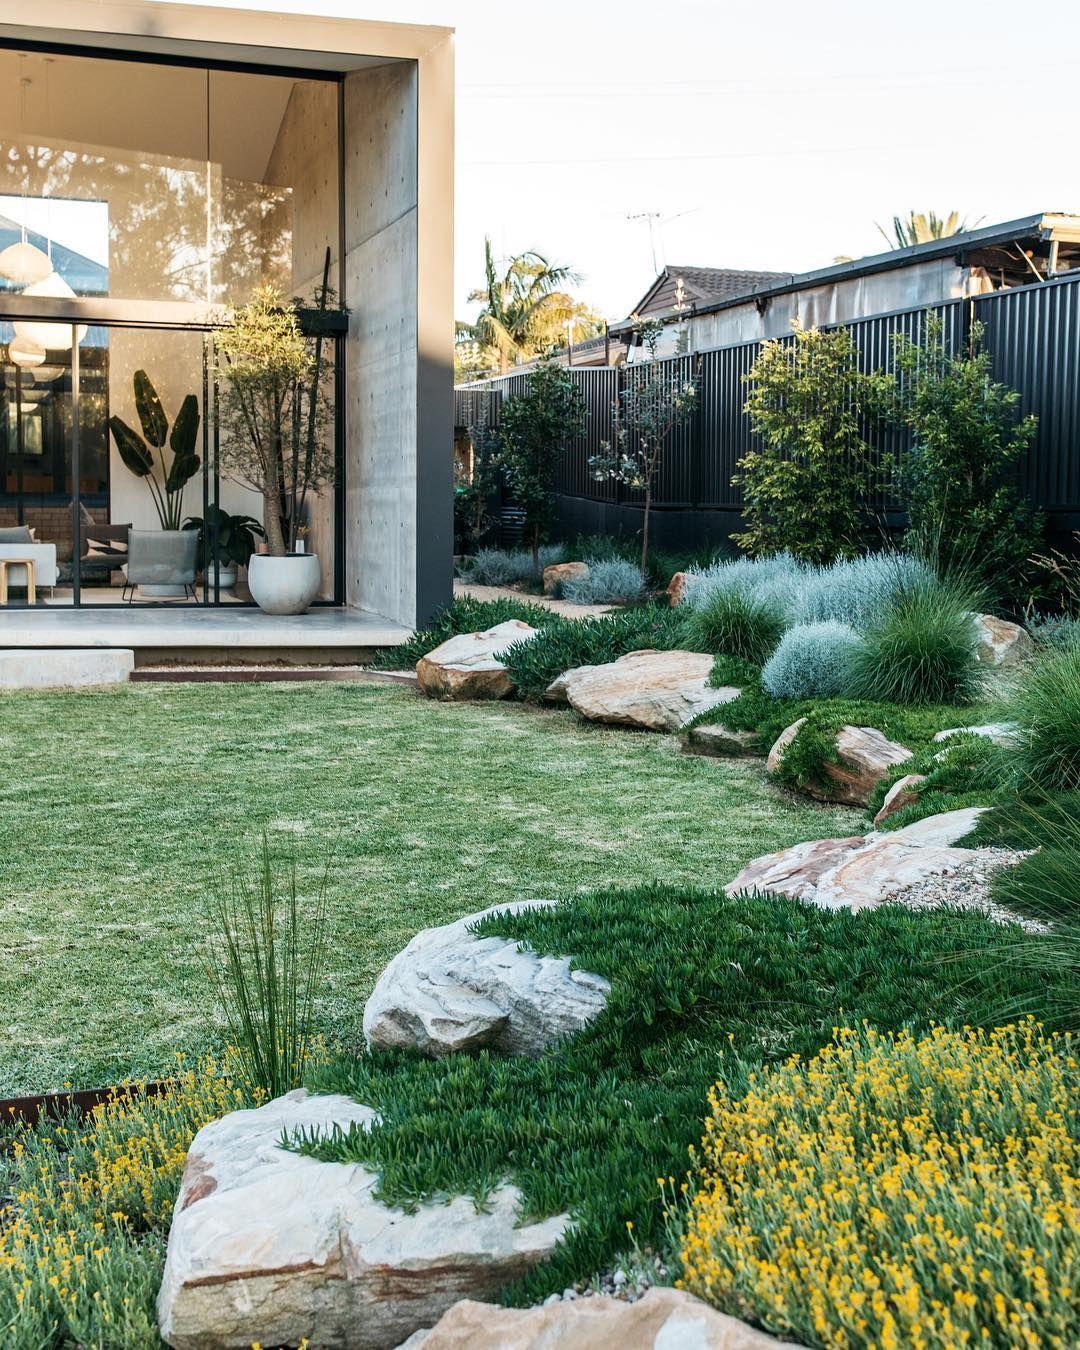 Garden Design With Modern Plant Landscape Ideas Simply: A Simply Beautiful Contemporary Australian Native Garden